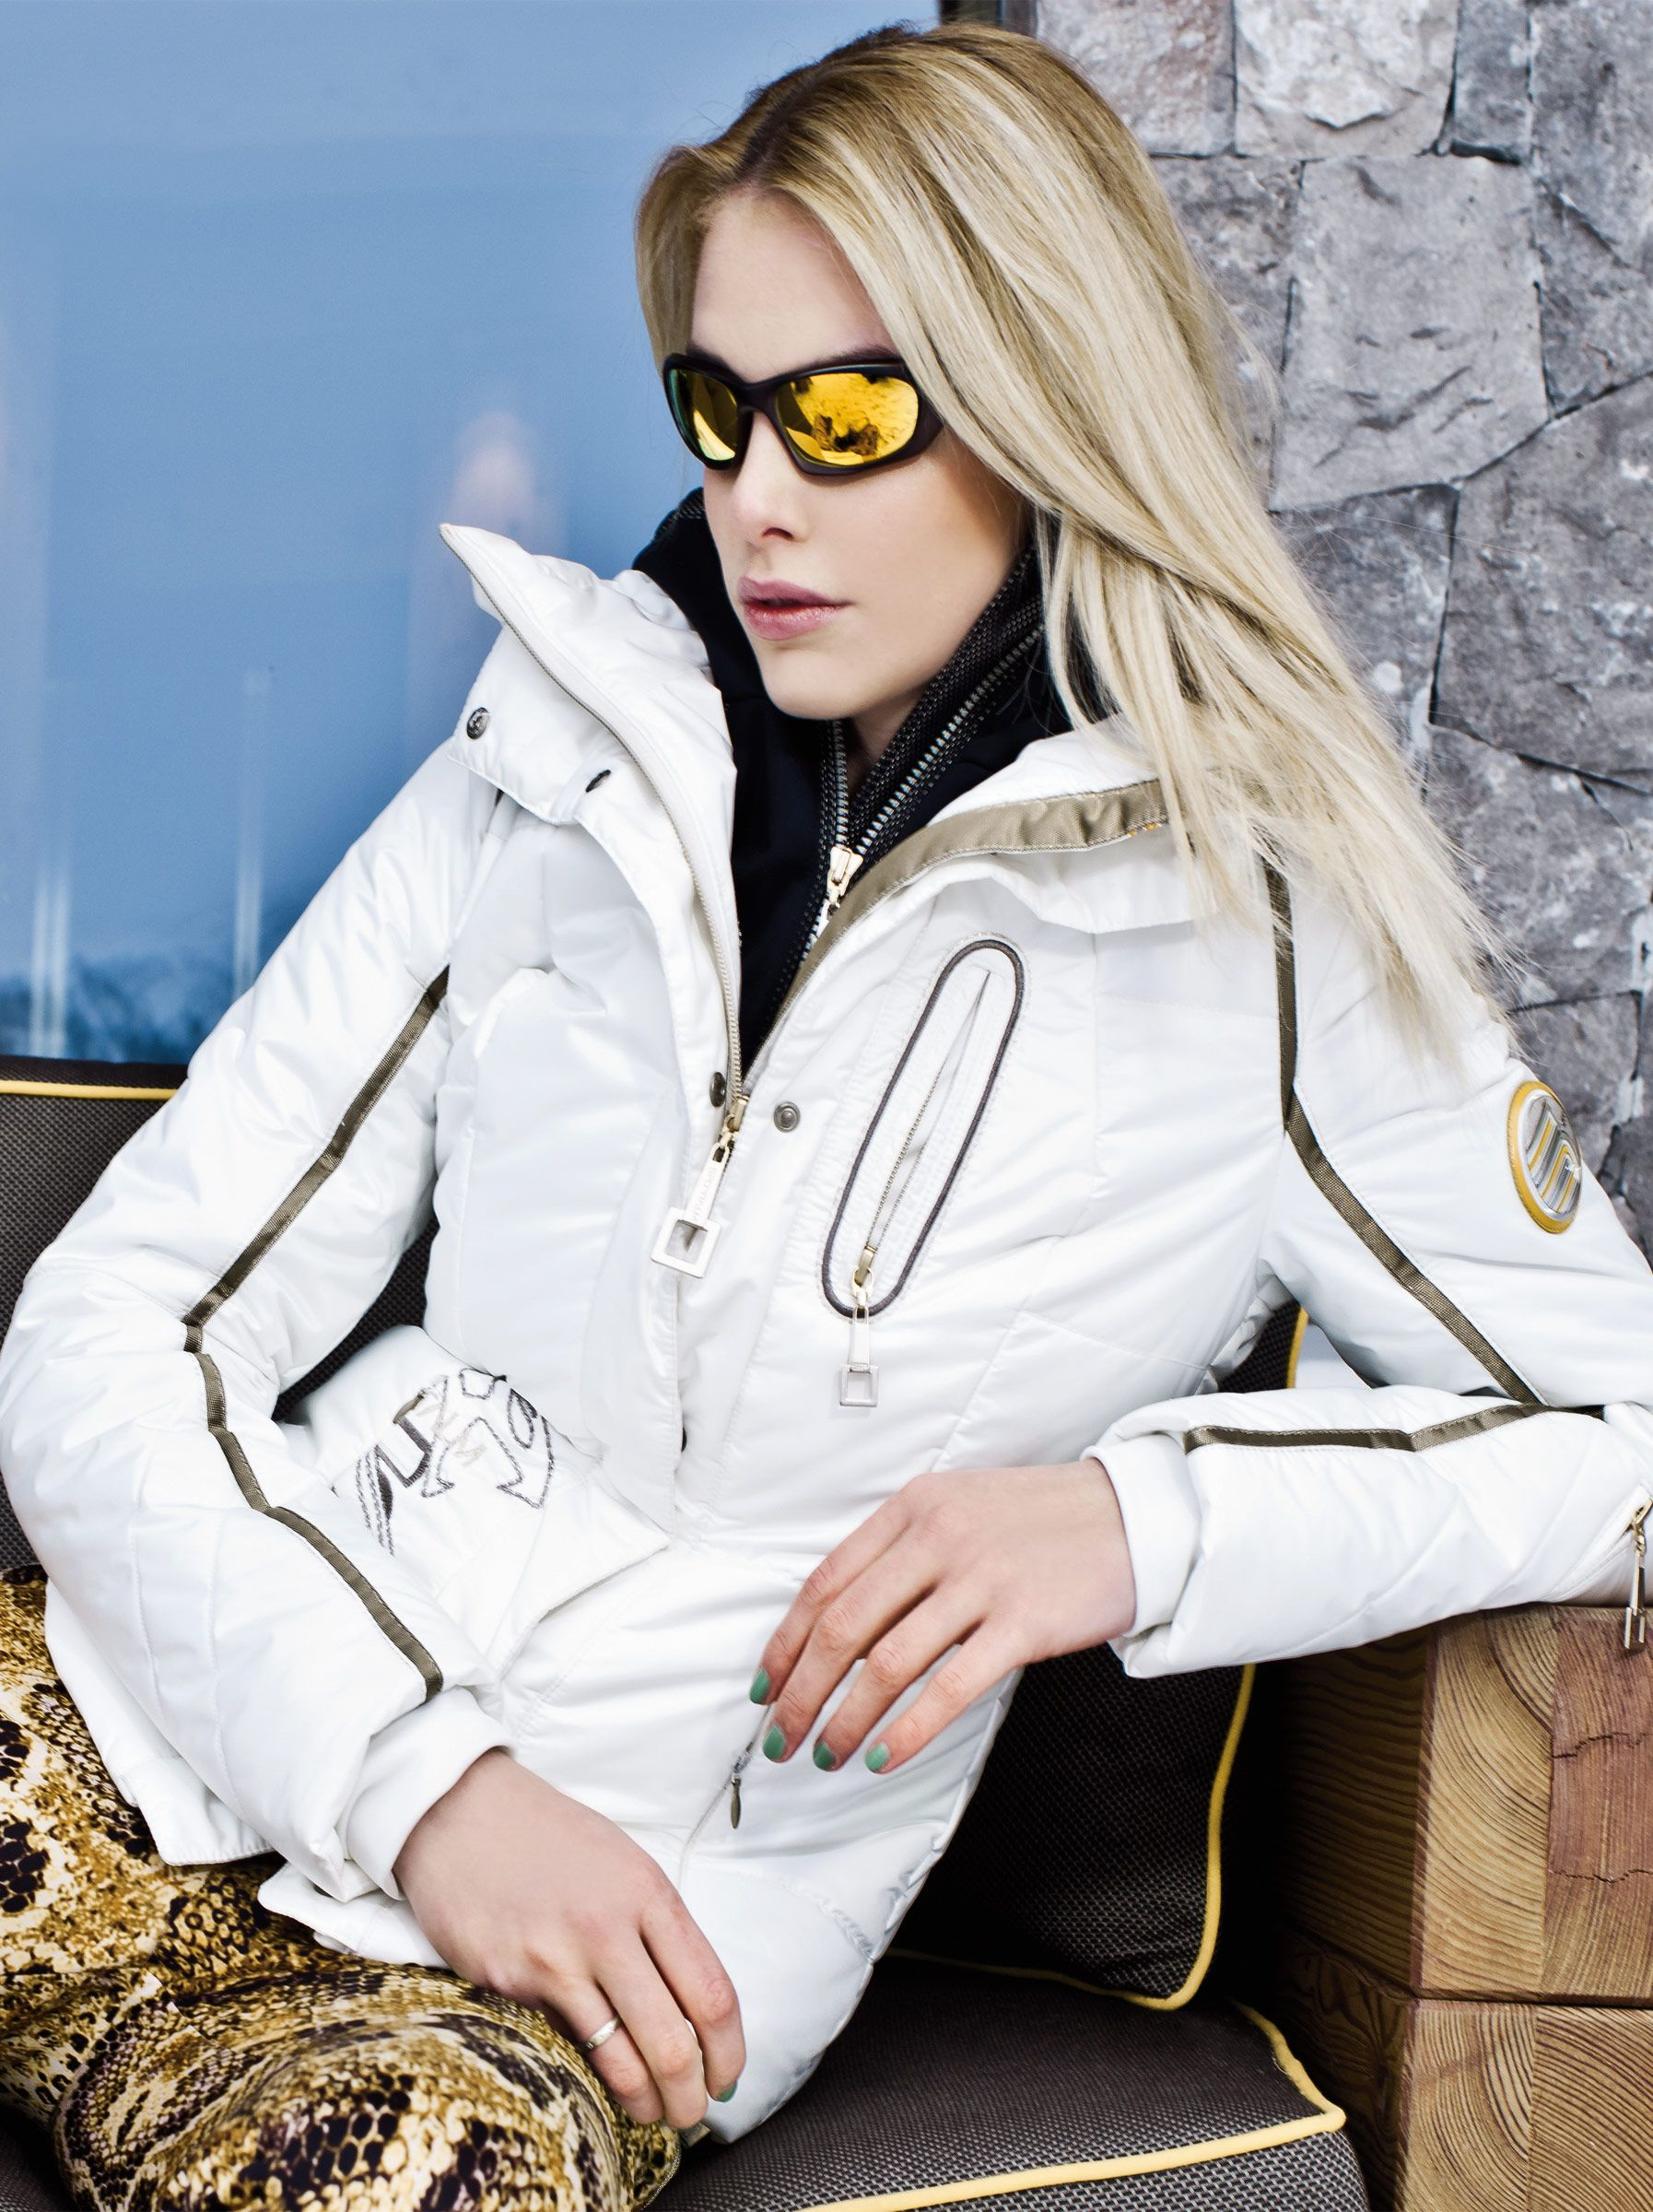 Womens Metalica Luxury Ski Jacket. Fashion and function by one of Europe s  best designers.  luxury  ski  aspen 72b6317f2